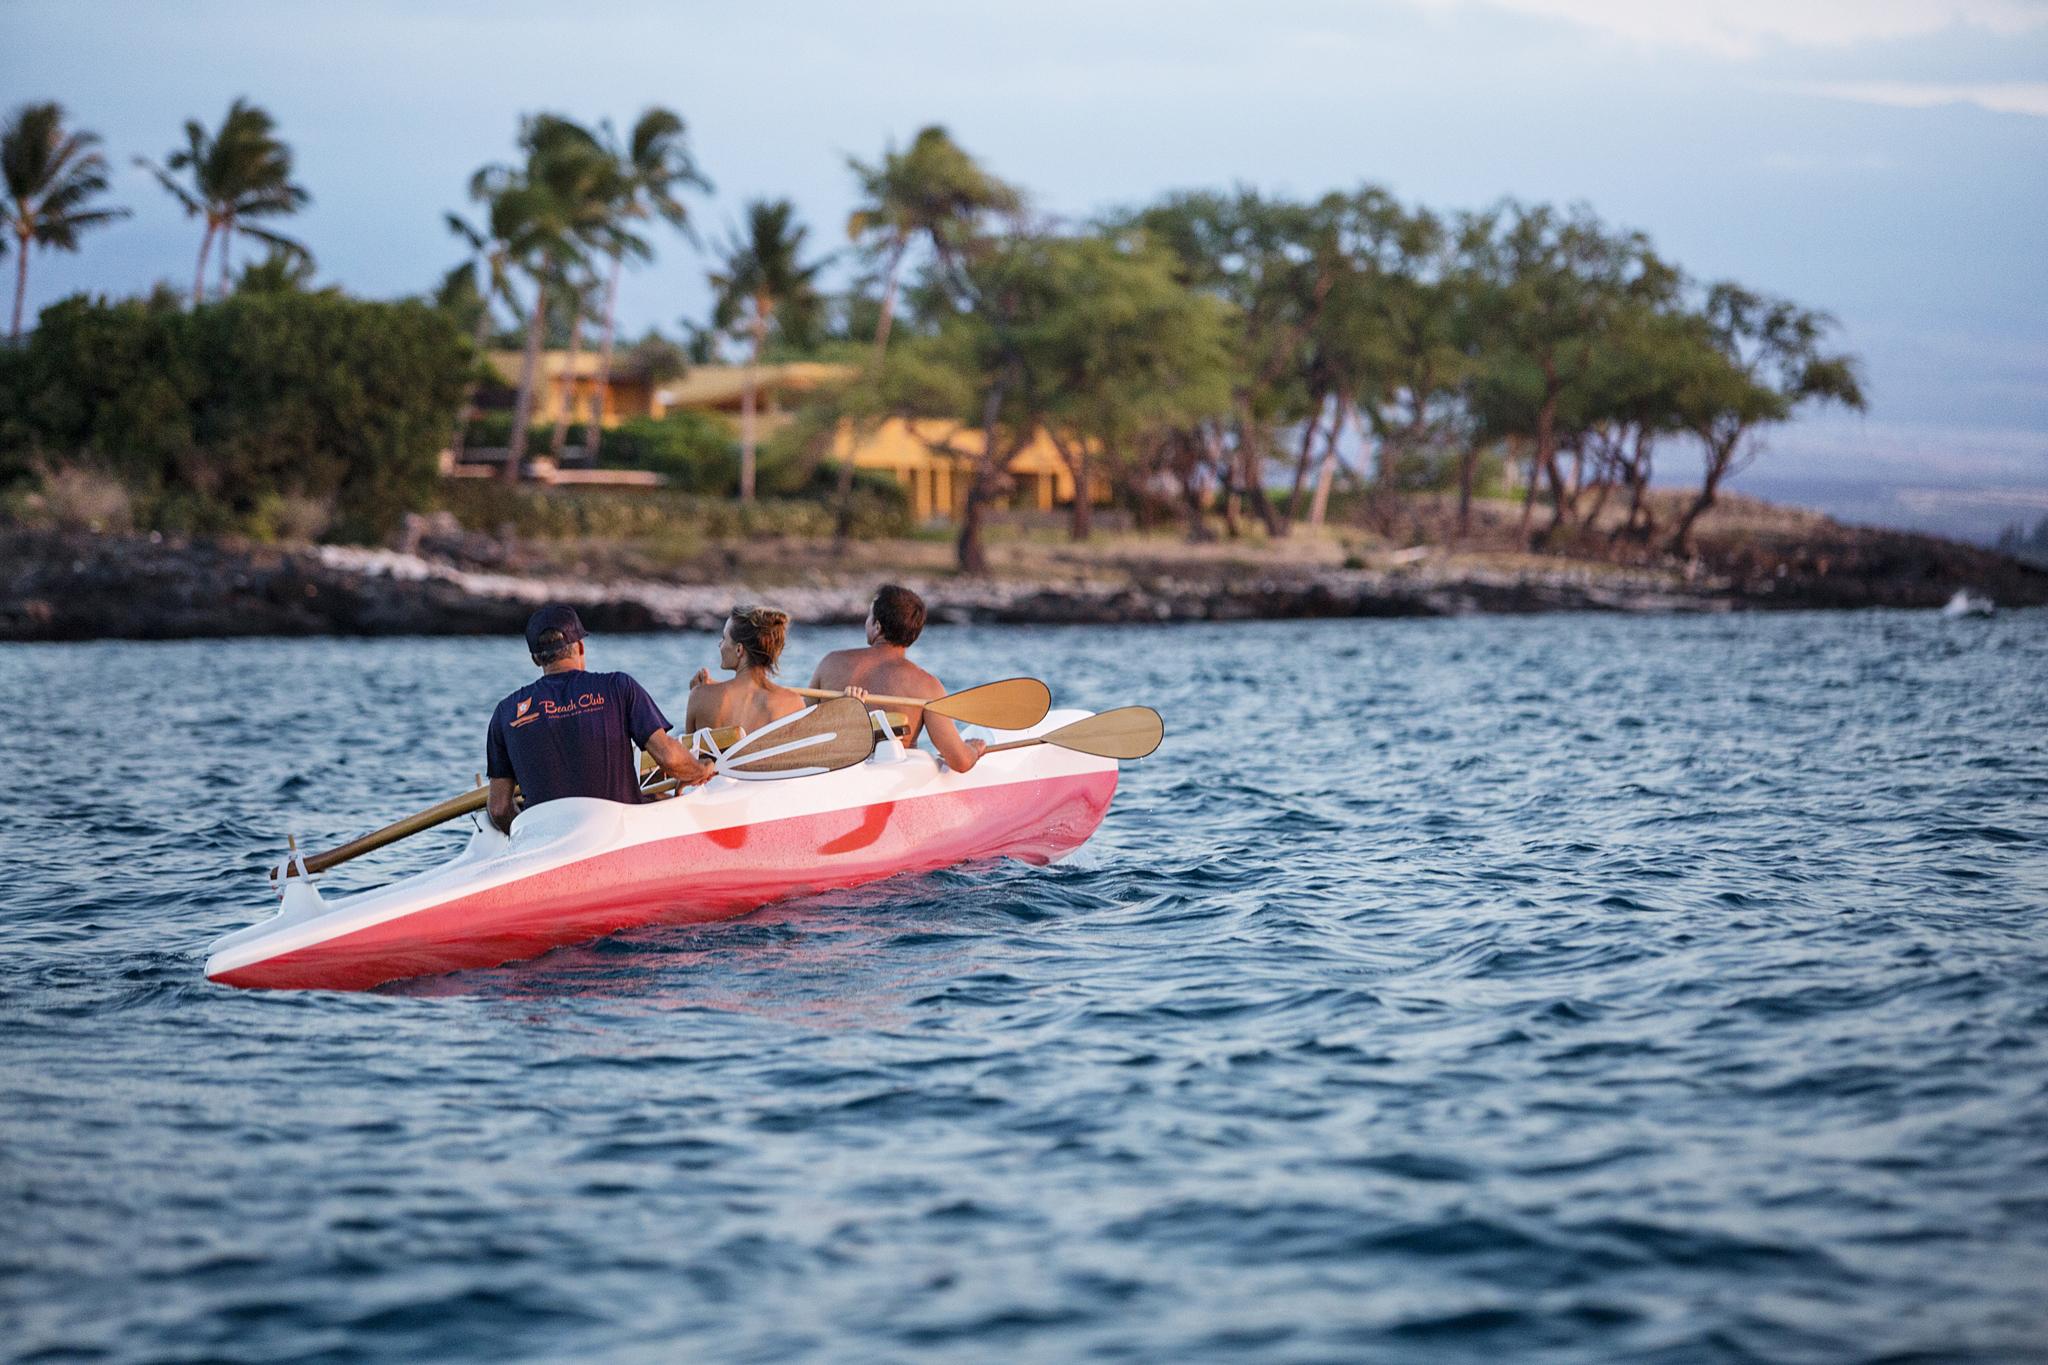 The Club Mauna Kea Resorts